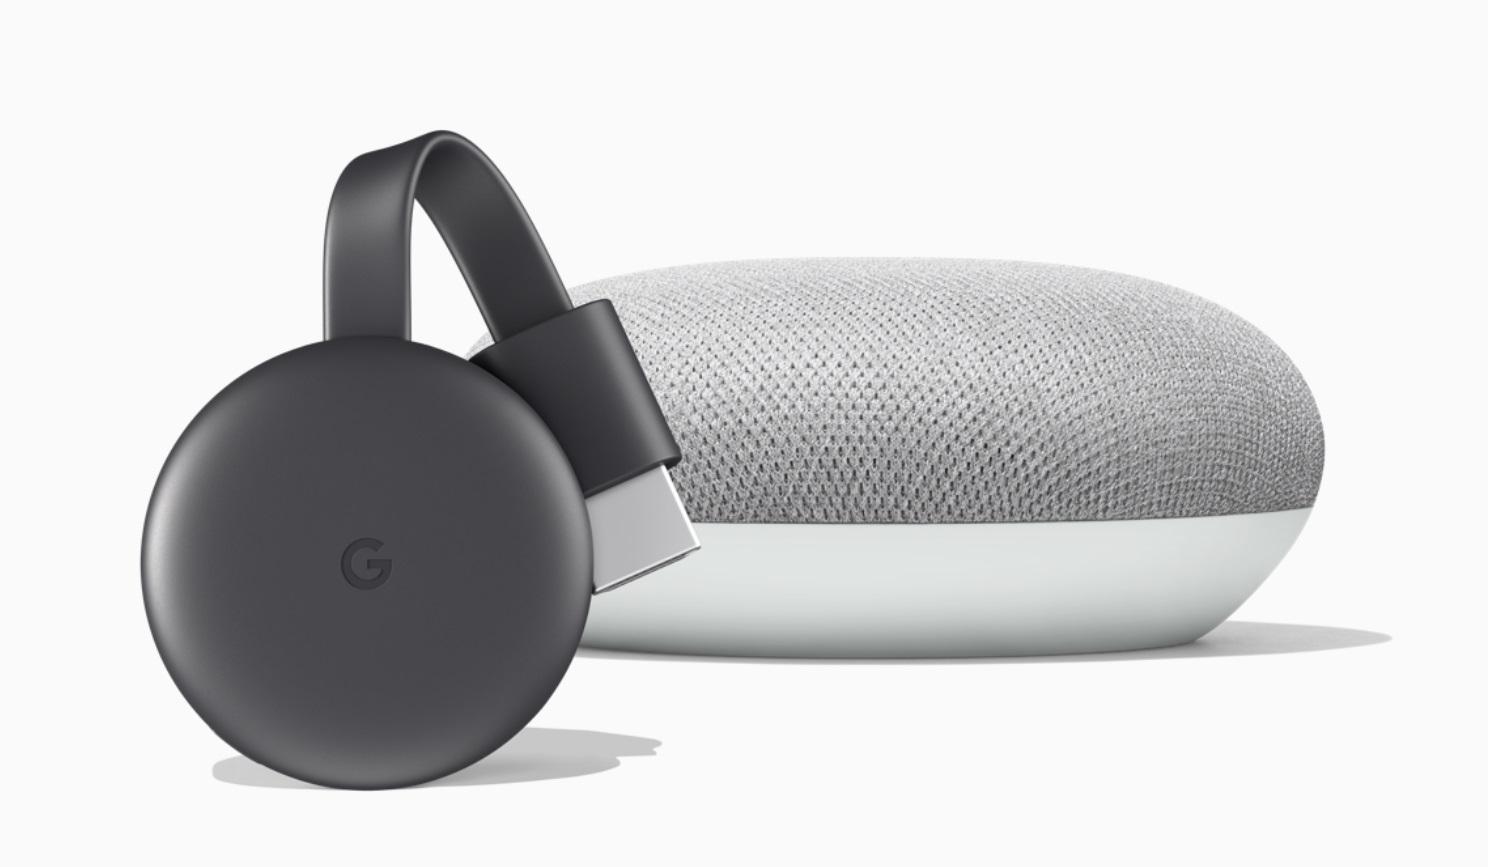 google s chromecast gets a new look